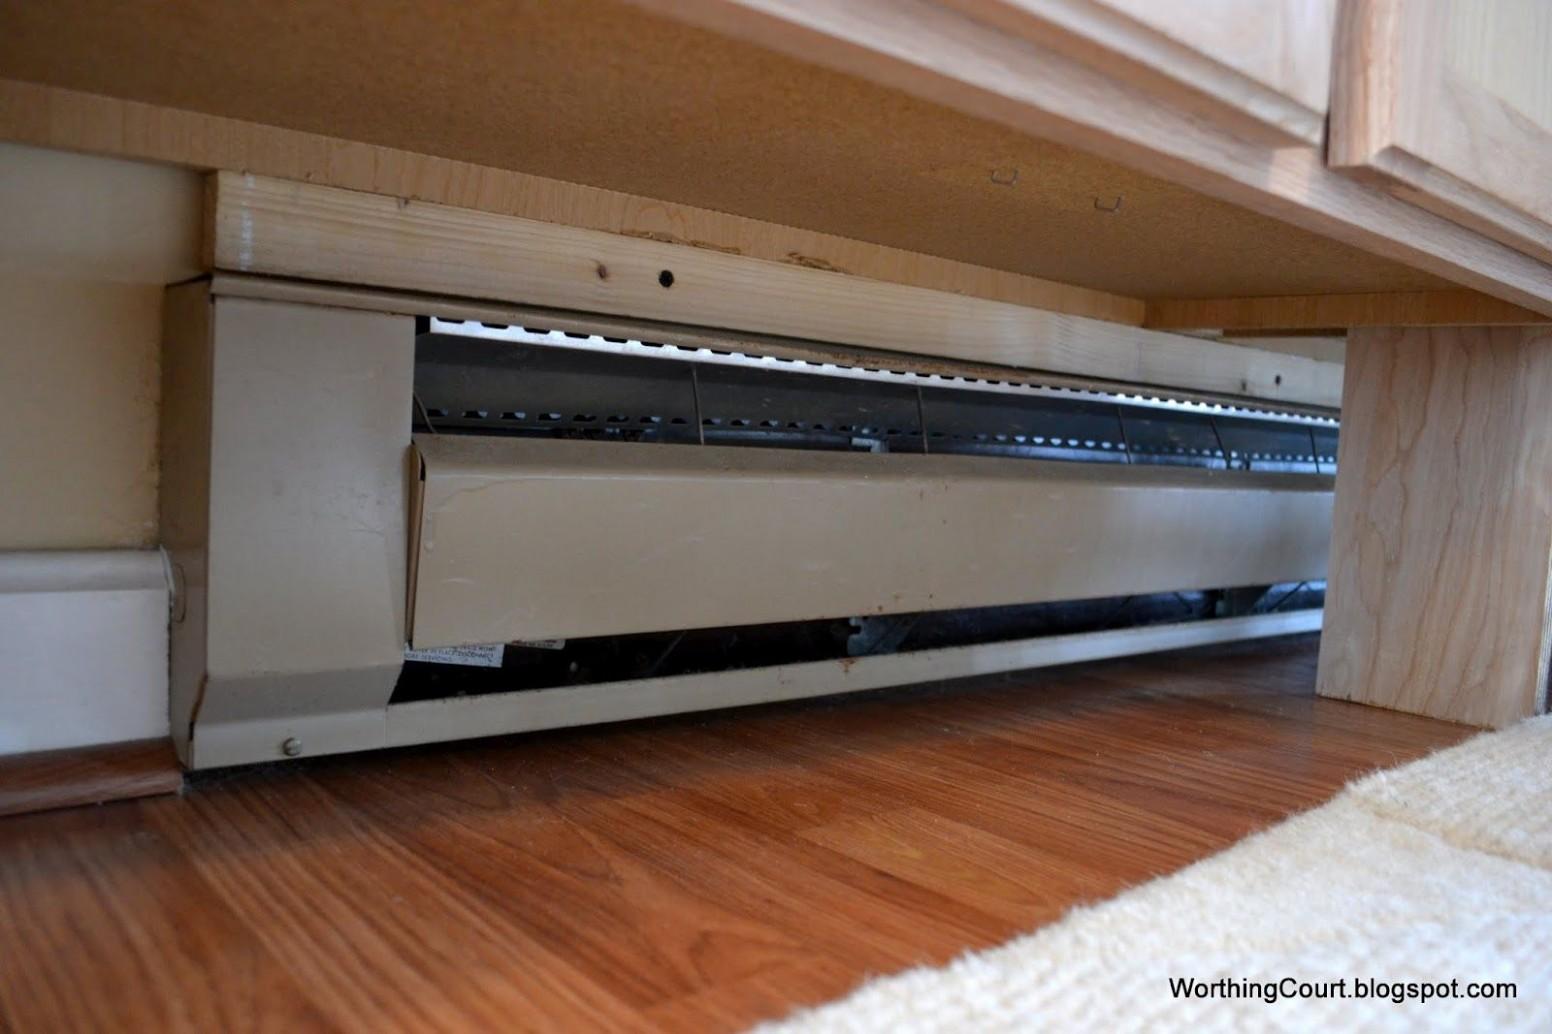 Work around baseboard heating  Baseboard heating, Baseboards  - Kitchen Cabinet Baseboard Heater